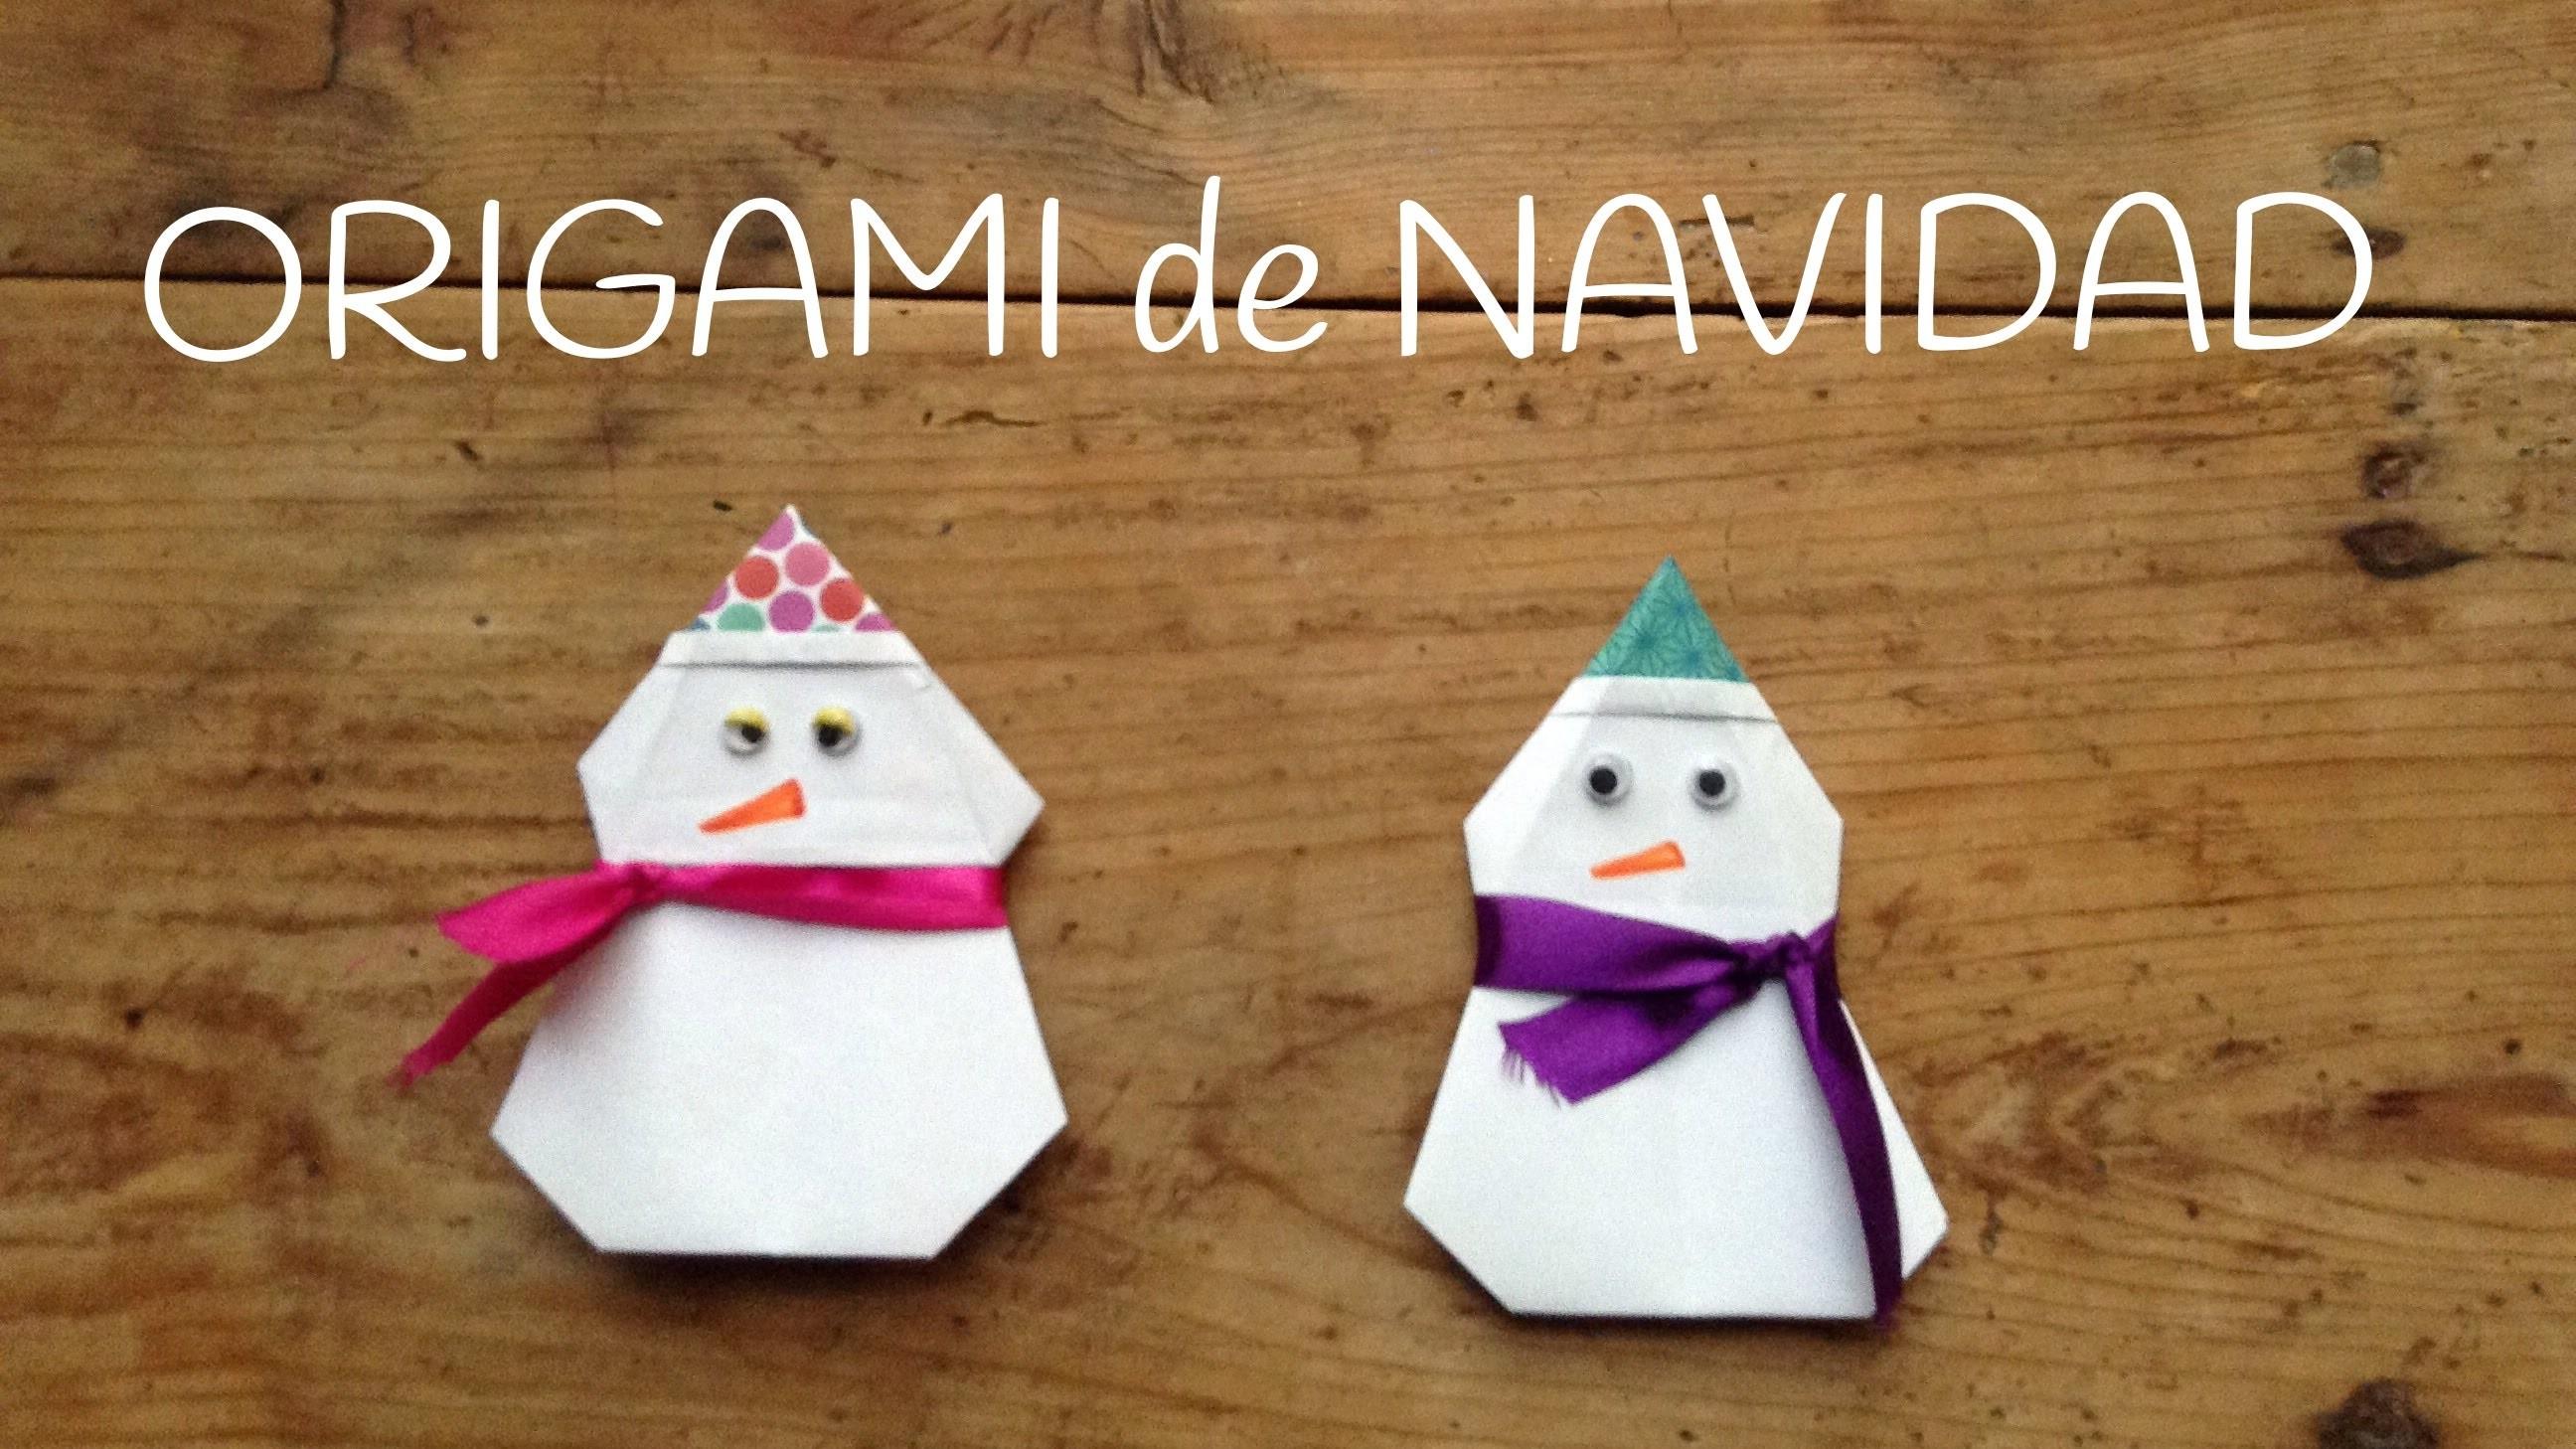 Origami f cil para ni os mu eco de nieve manualidades - Como hacer manualidades faciles para ninos ...